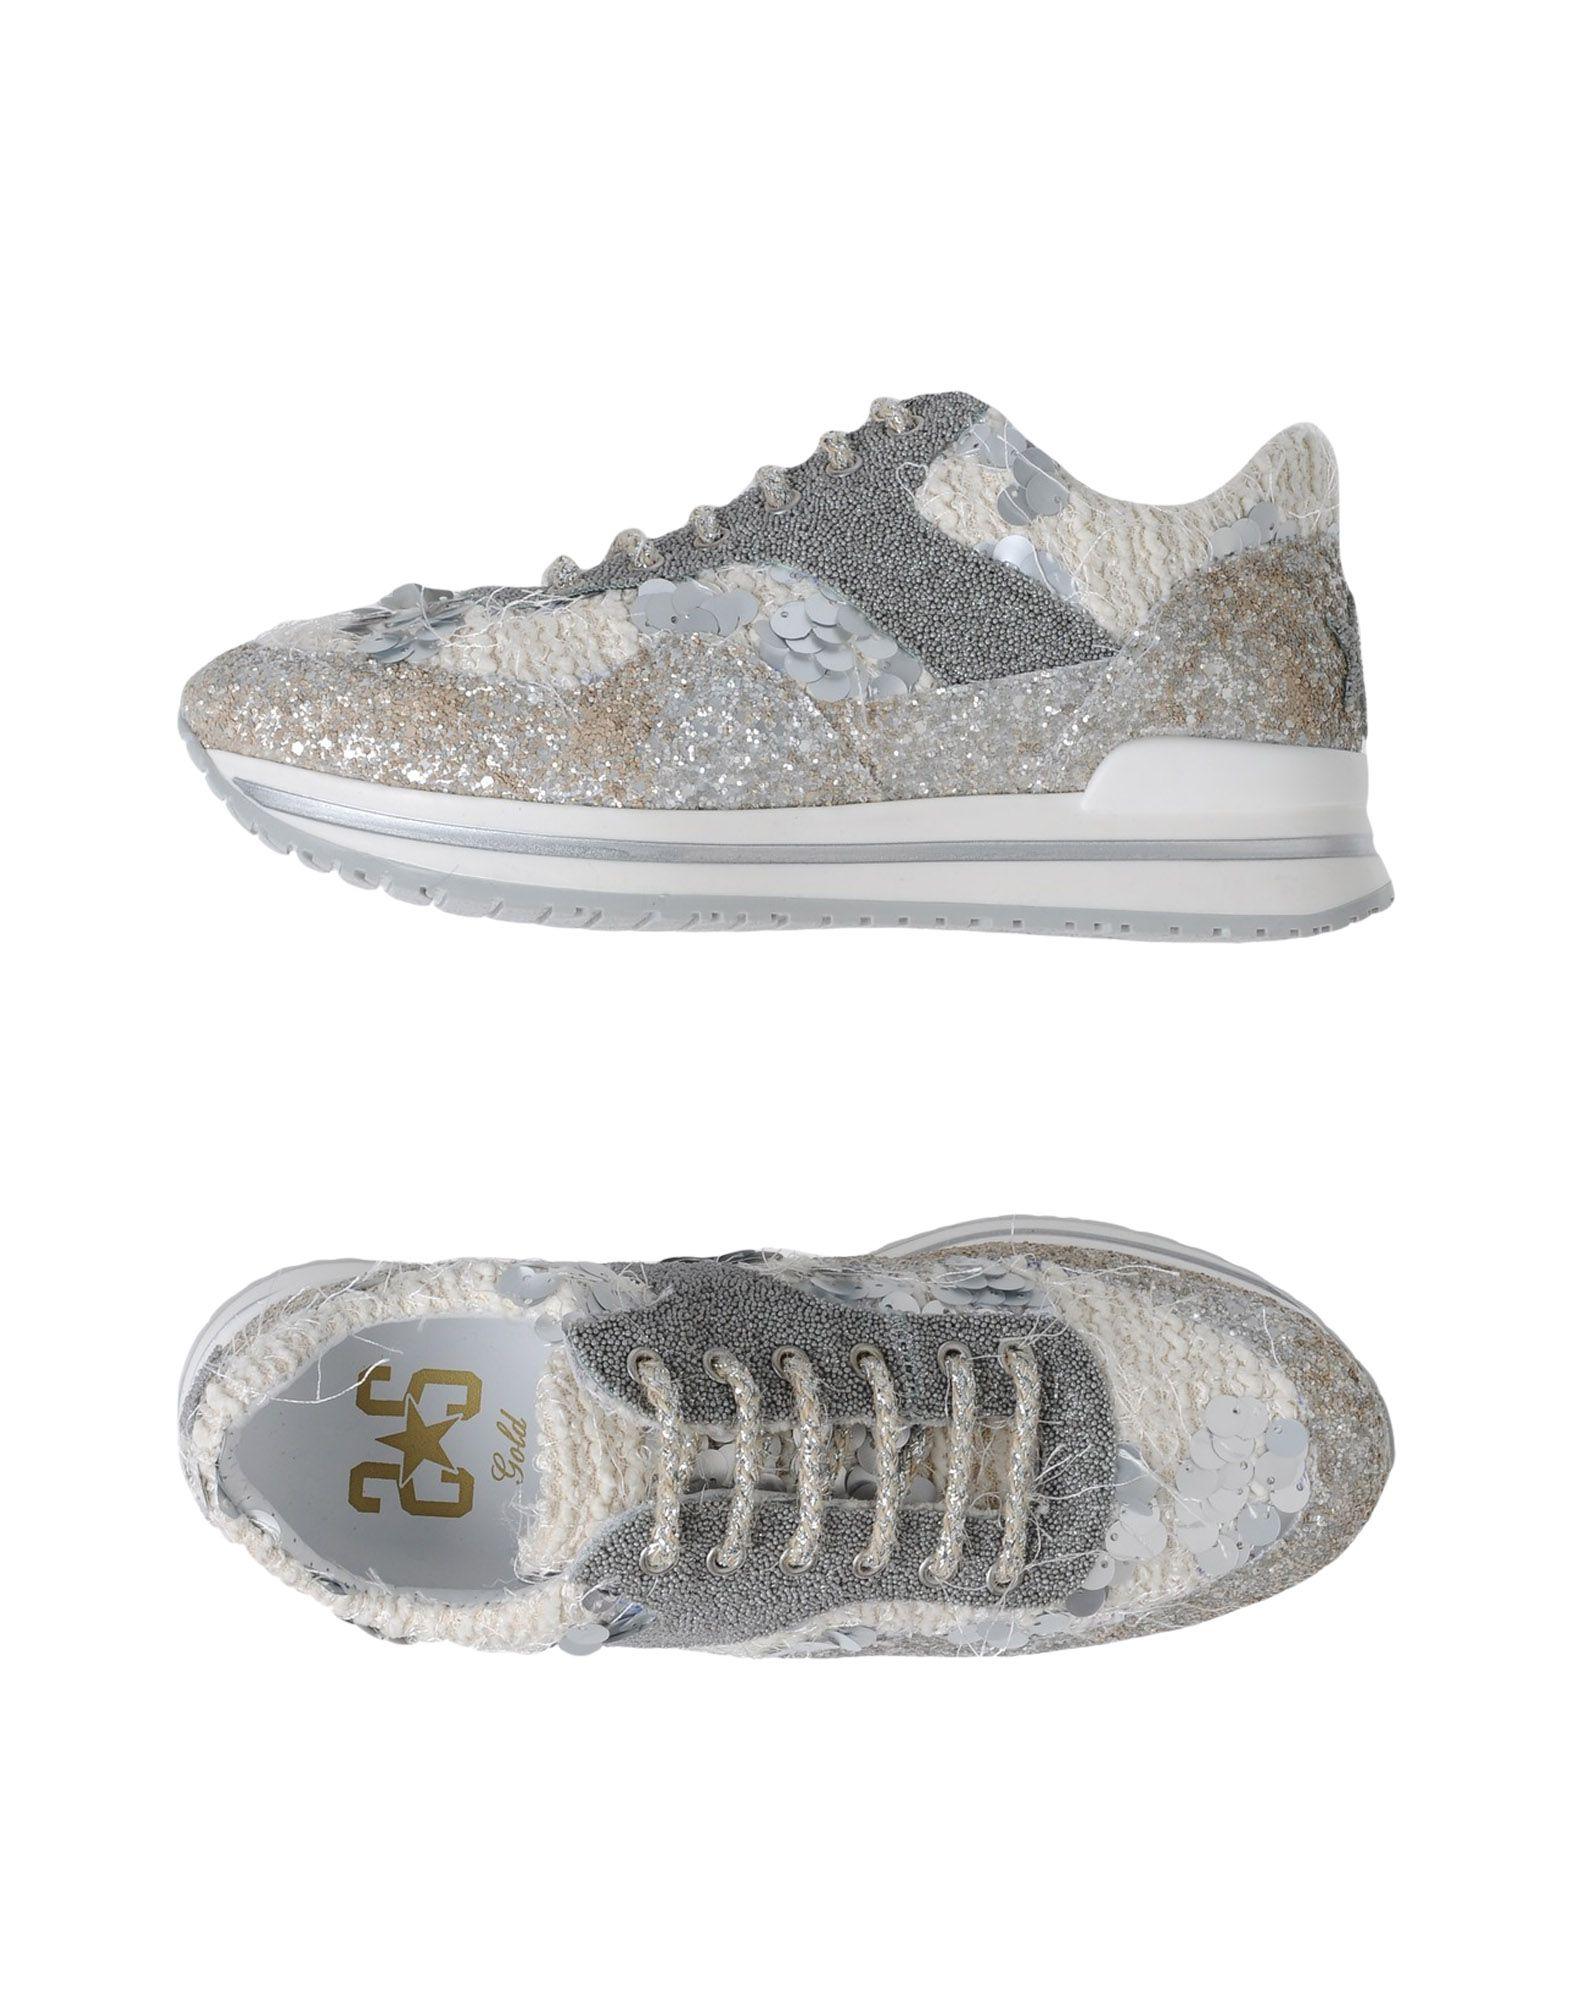 2Star Sneakers Damen   Damen 11337198SN  1db2d6